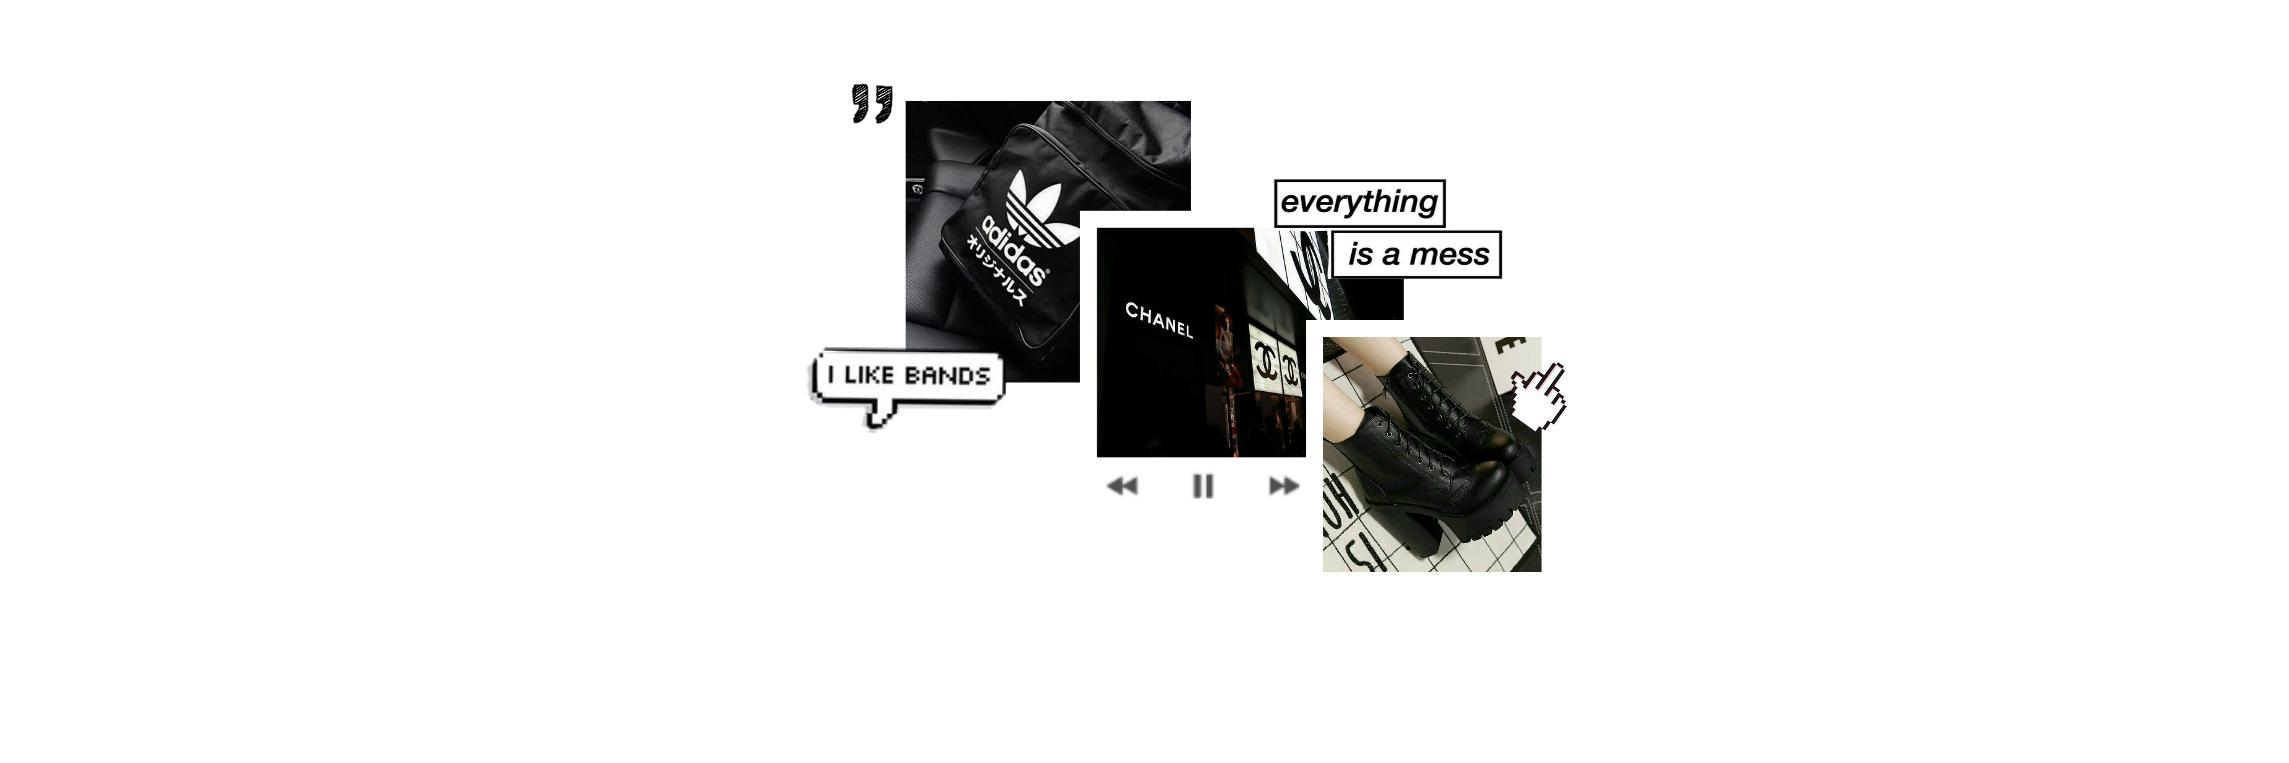 Freetoedit Aesthetic Header Twitterpack Collage Black